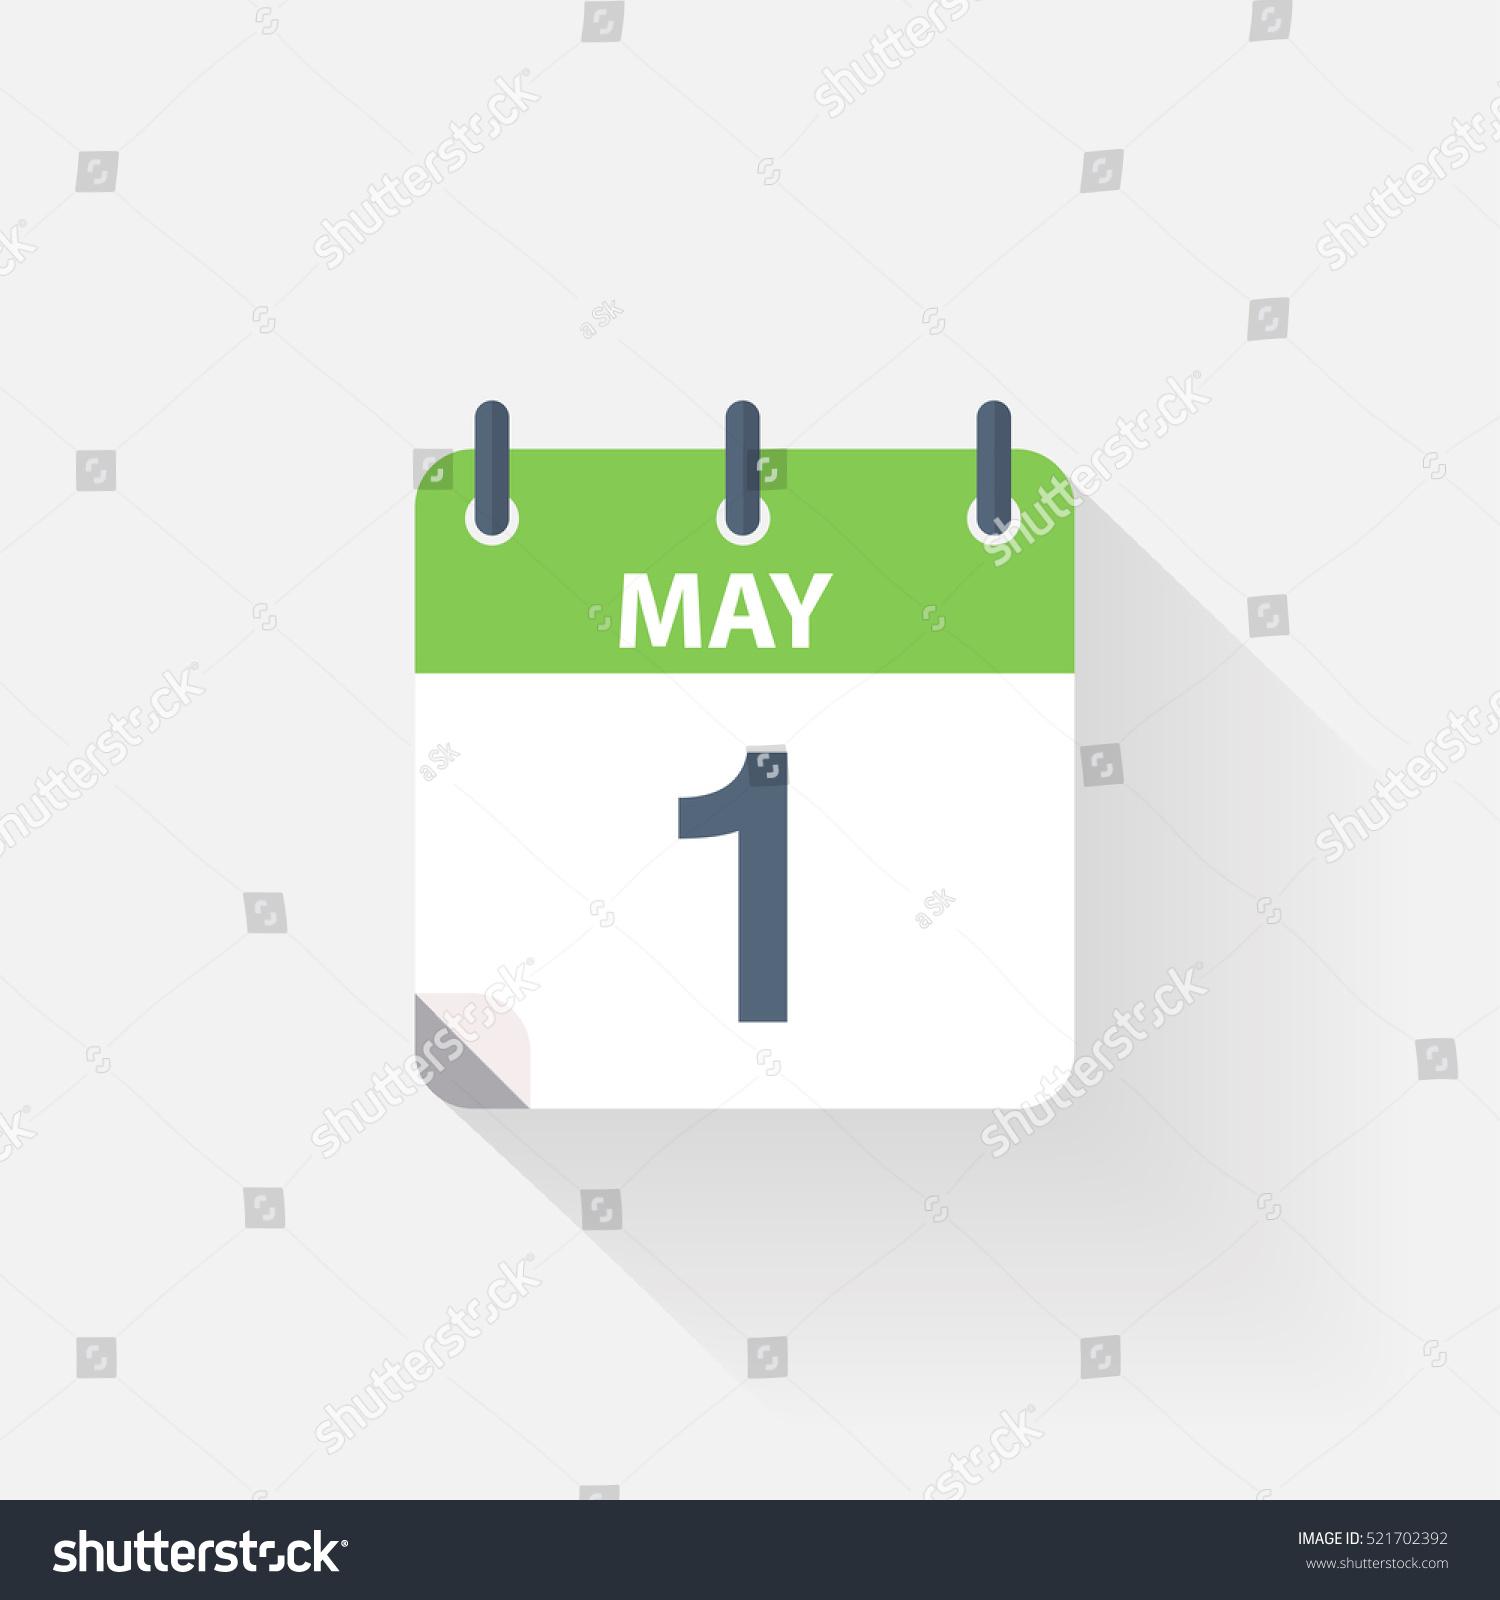 May Calendar Vector : May calendar icon on grey background stock vector